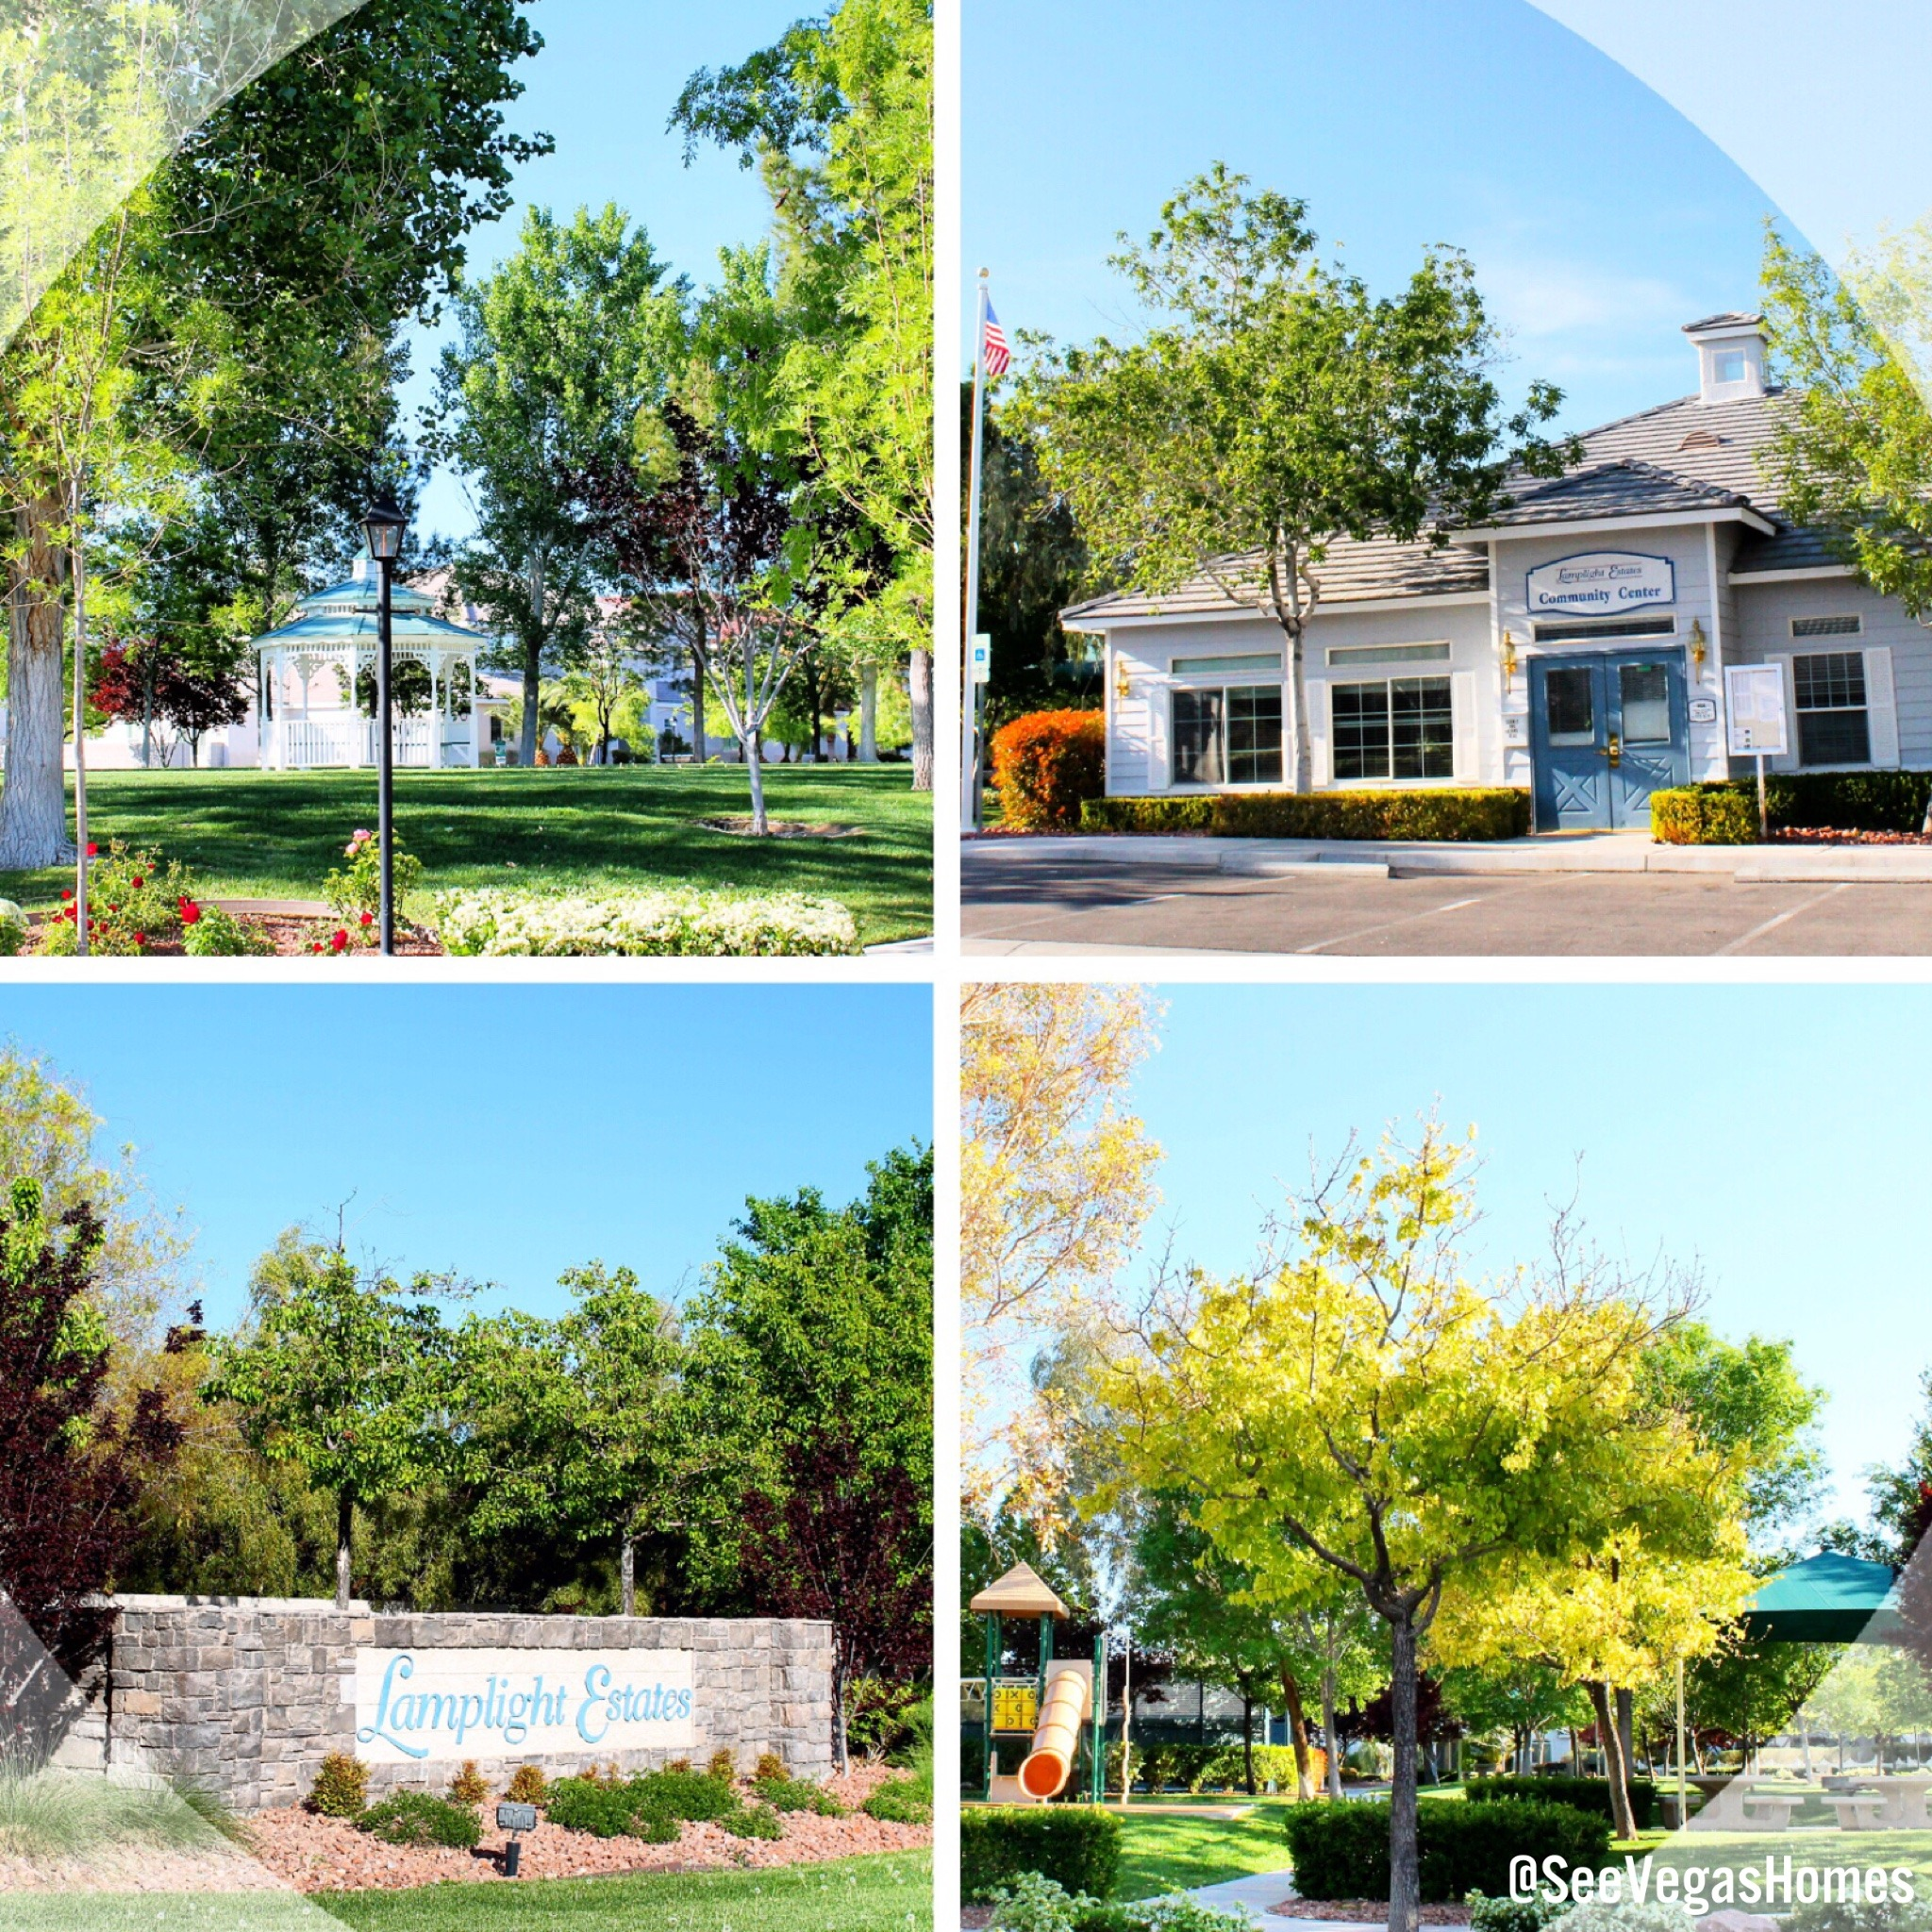 lamplight estates 89131 homes for sale With lamplight estates las vegas